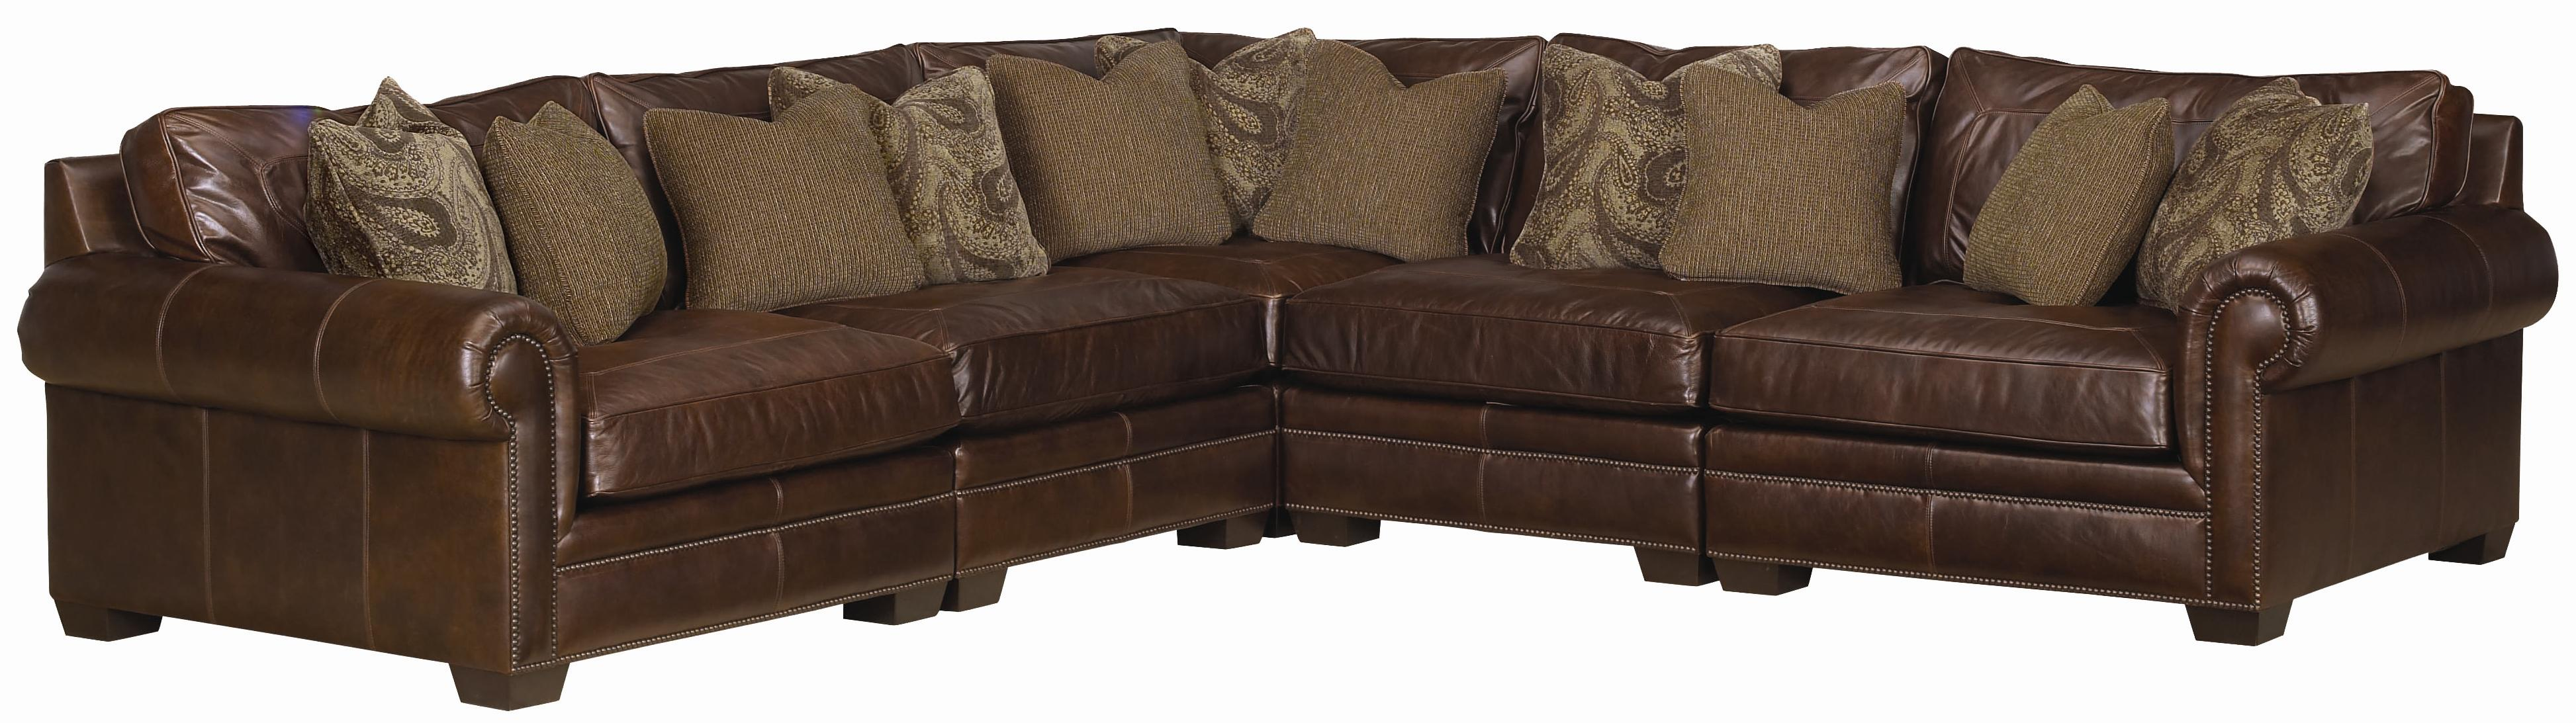 bernhardt breckenridge sofa cheers clayton costco grandview 5 piece traditional sectional